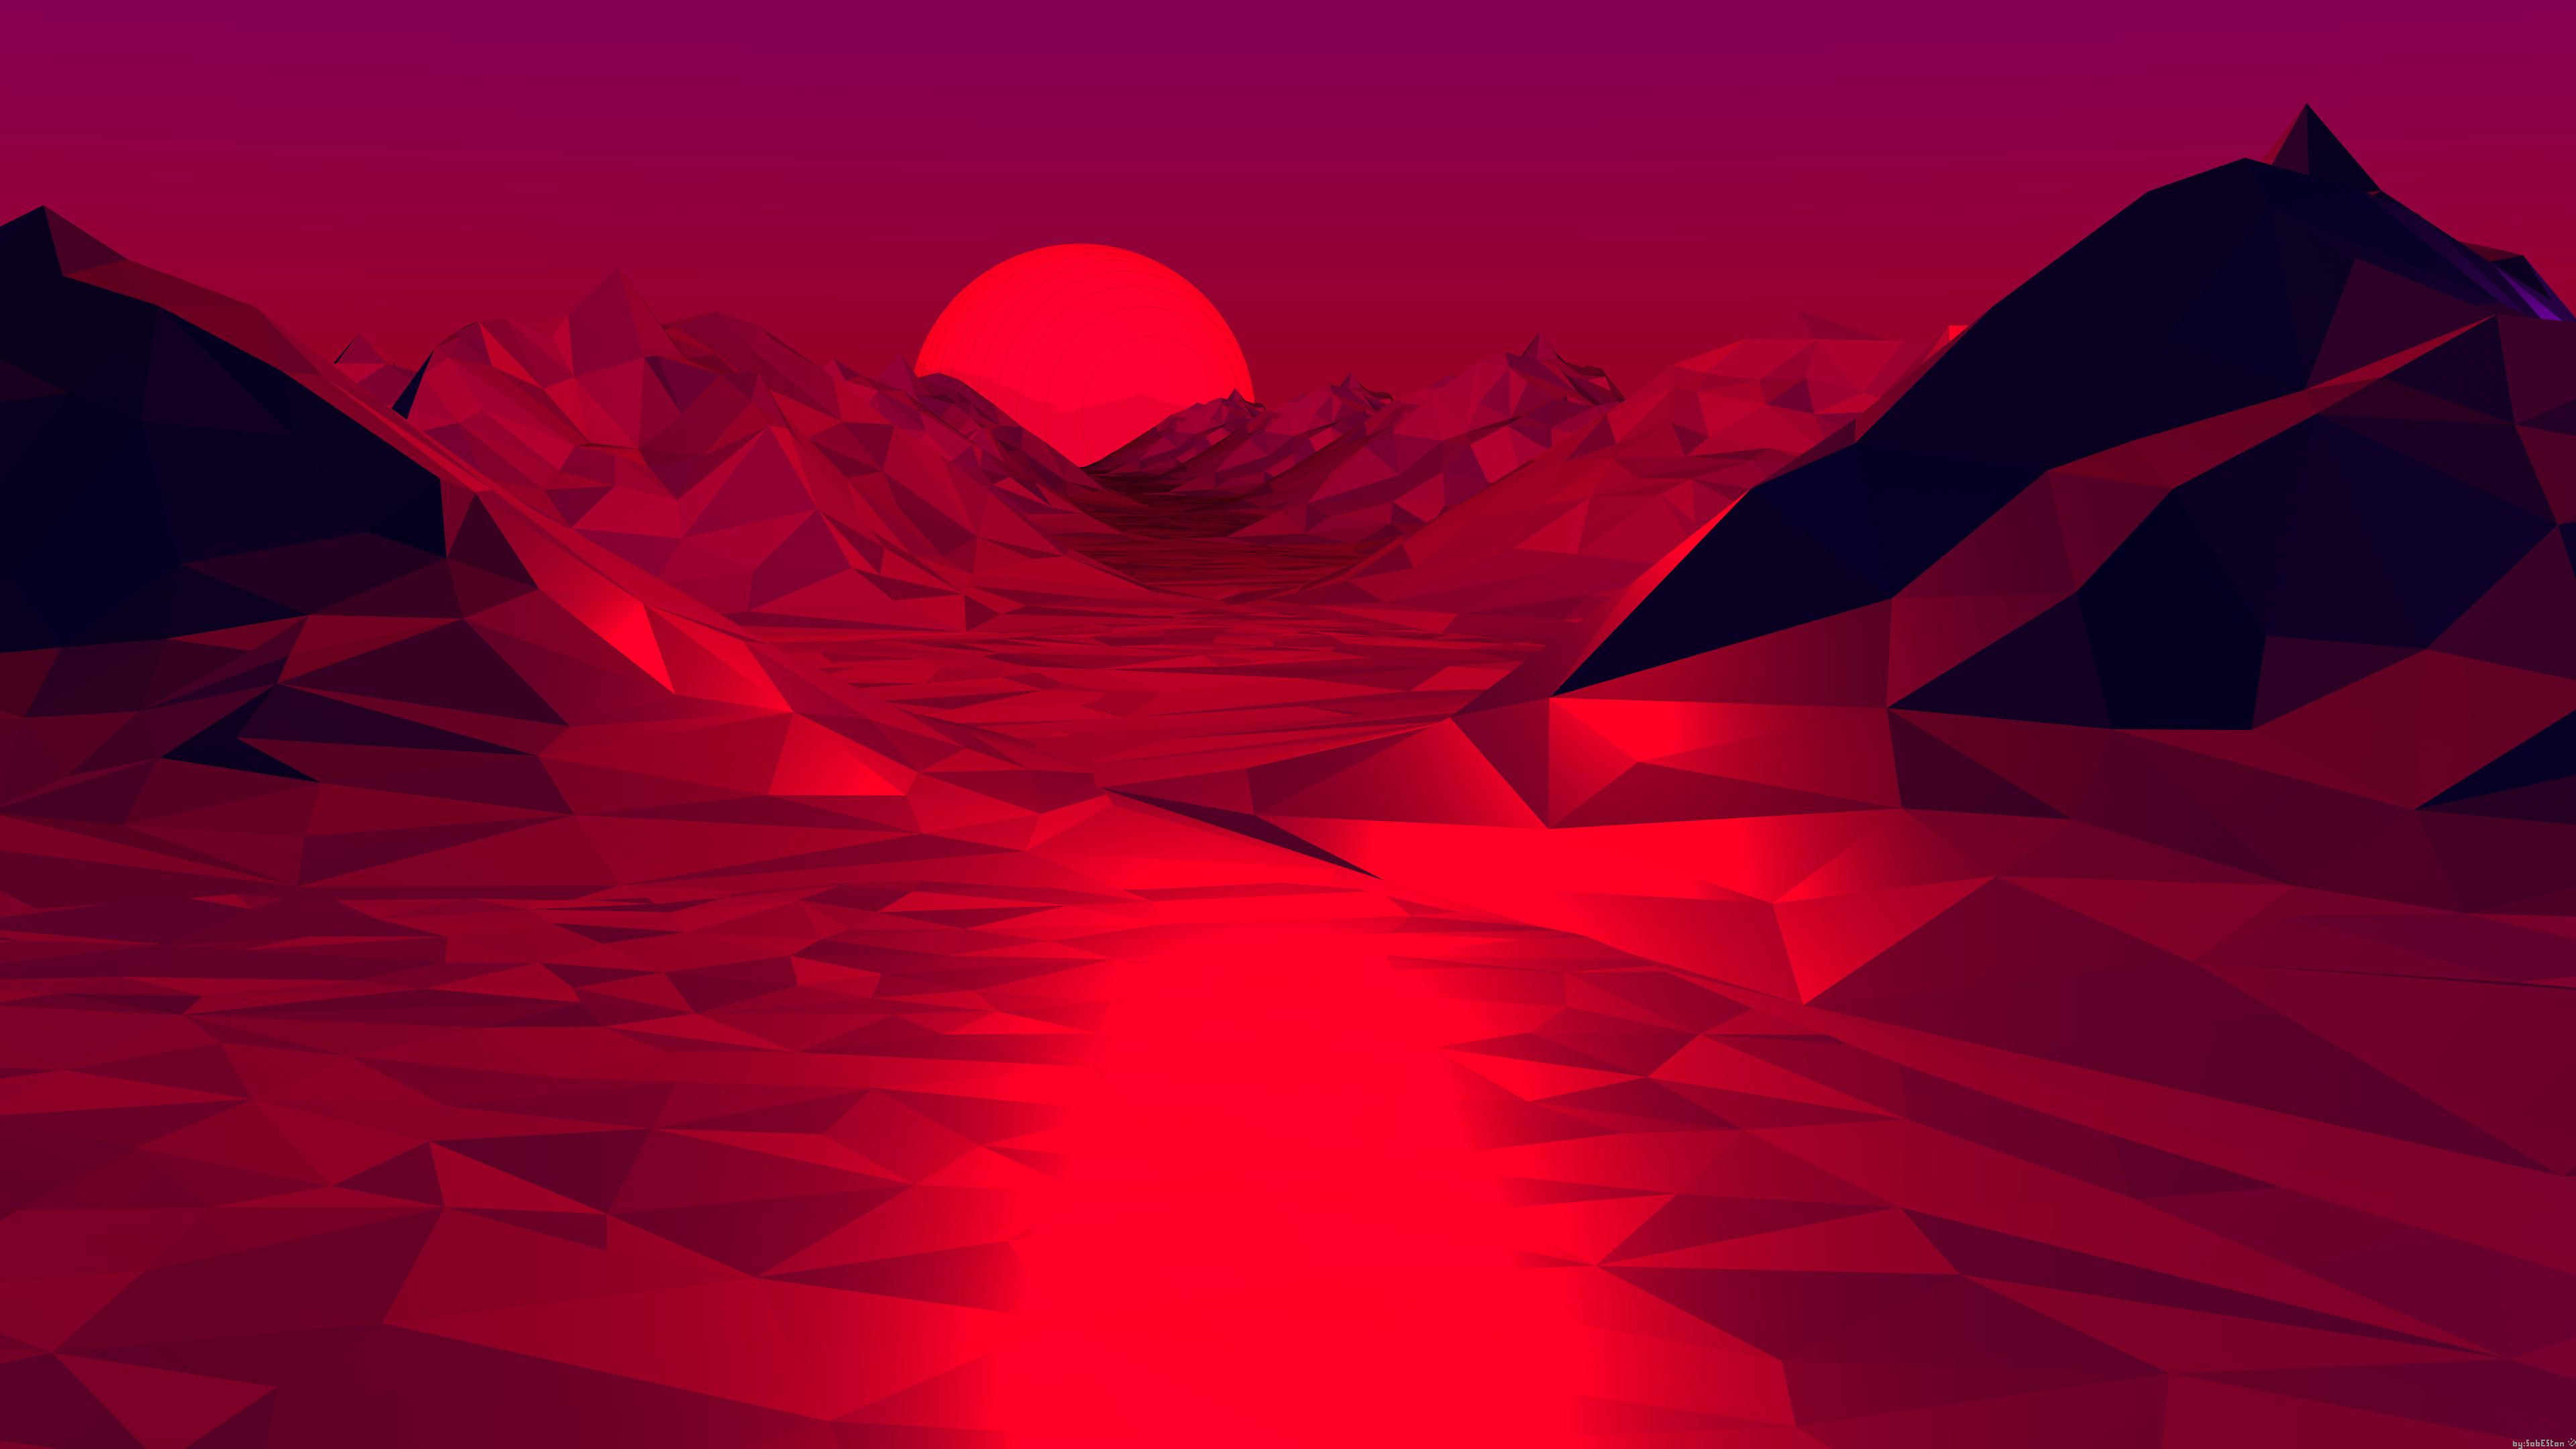 low poly red 3d abstract 4k 1539371309 - Low Poly Red 3d Abstract 4k - red wallpapers, low poly wallpapers, hd-wallpapers, digital art wallpapers, abstract wallpapers, 4k-wallpapers, 3d wallpapers